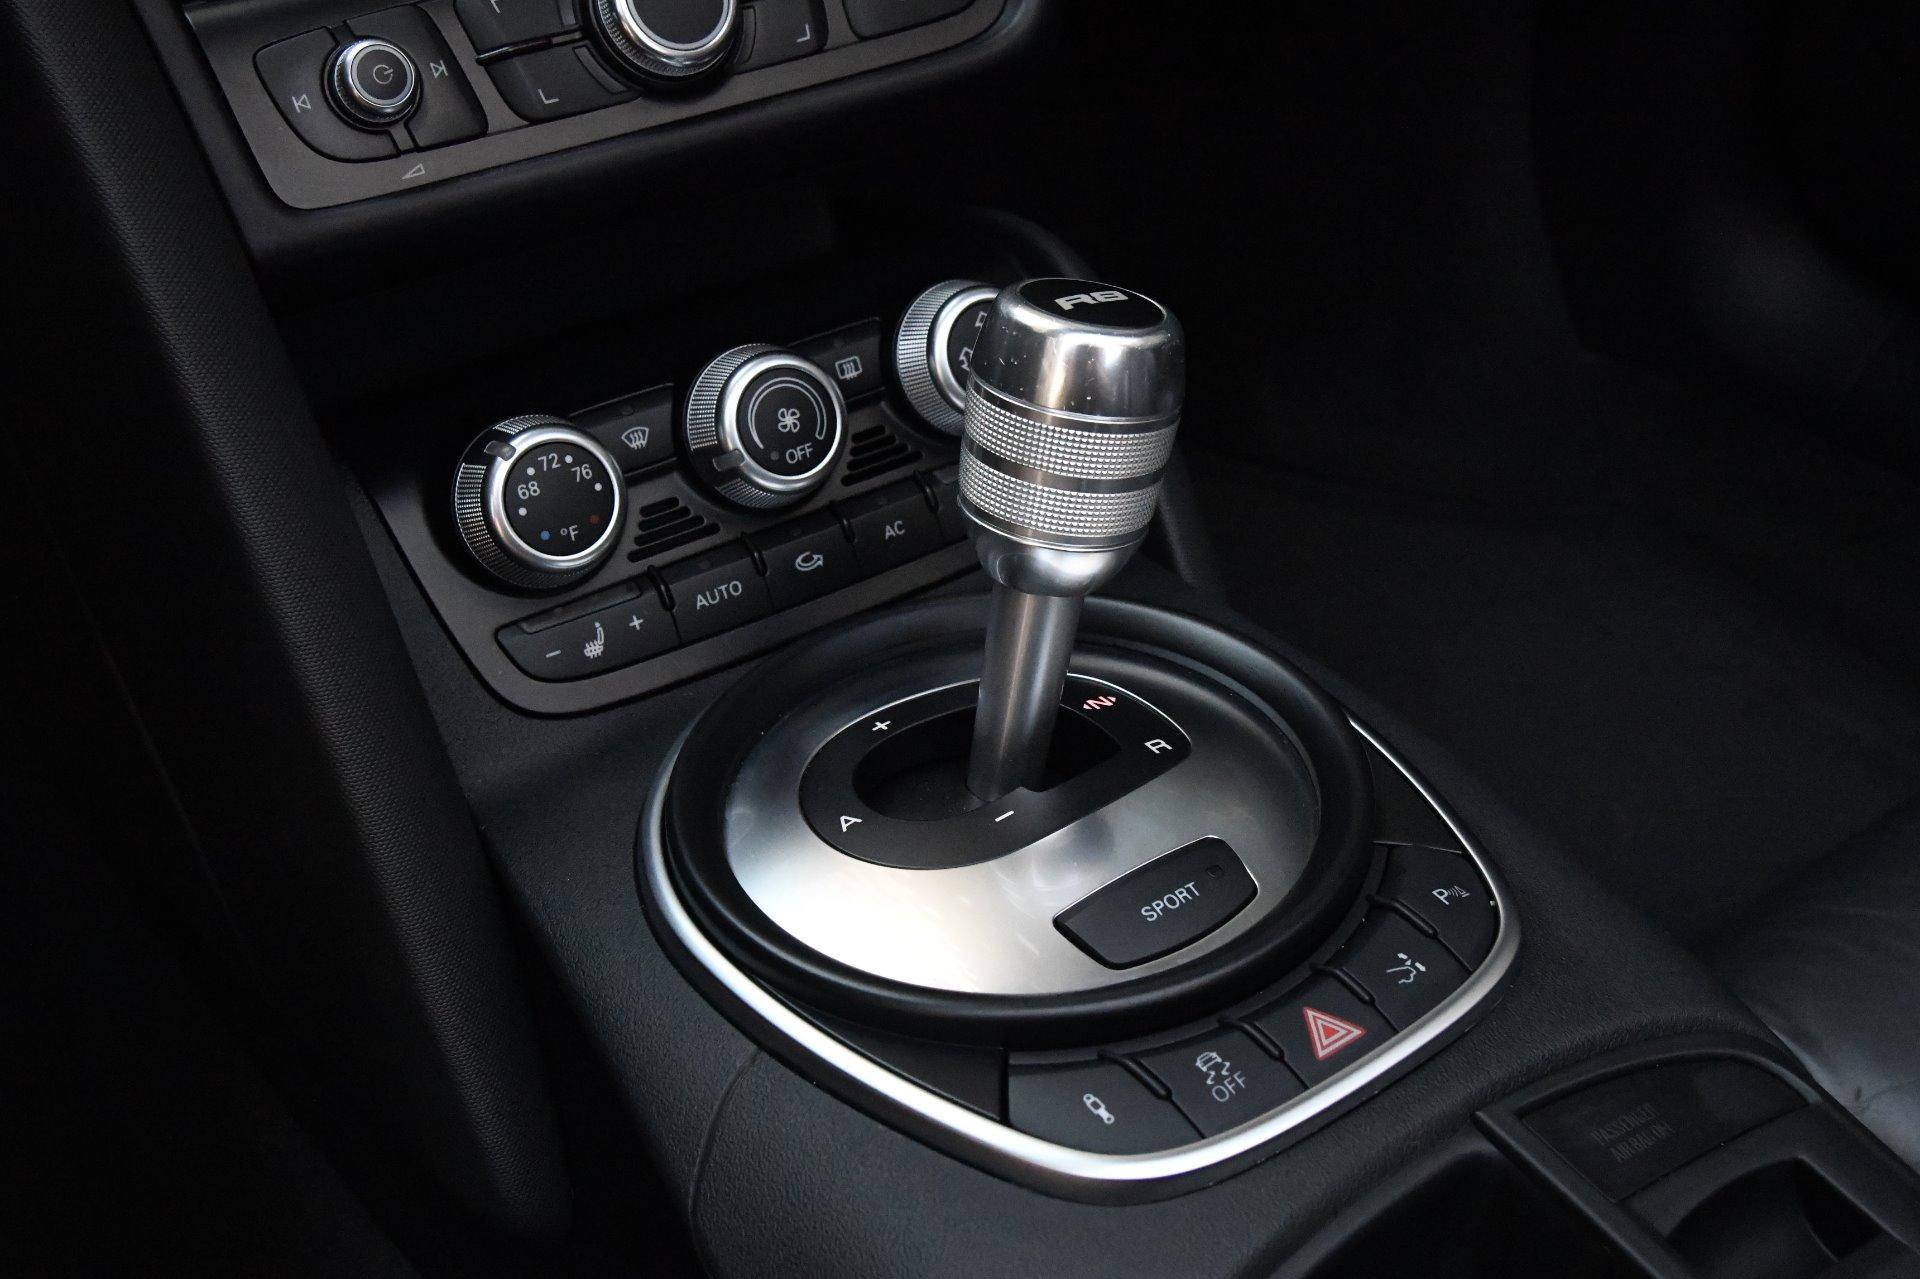 Used 2011 Audi R8 4.2 quattro Spyder | Chicago, IL